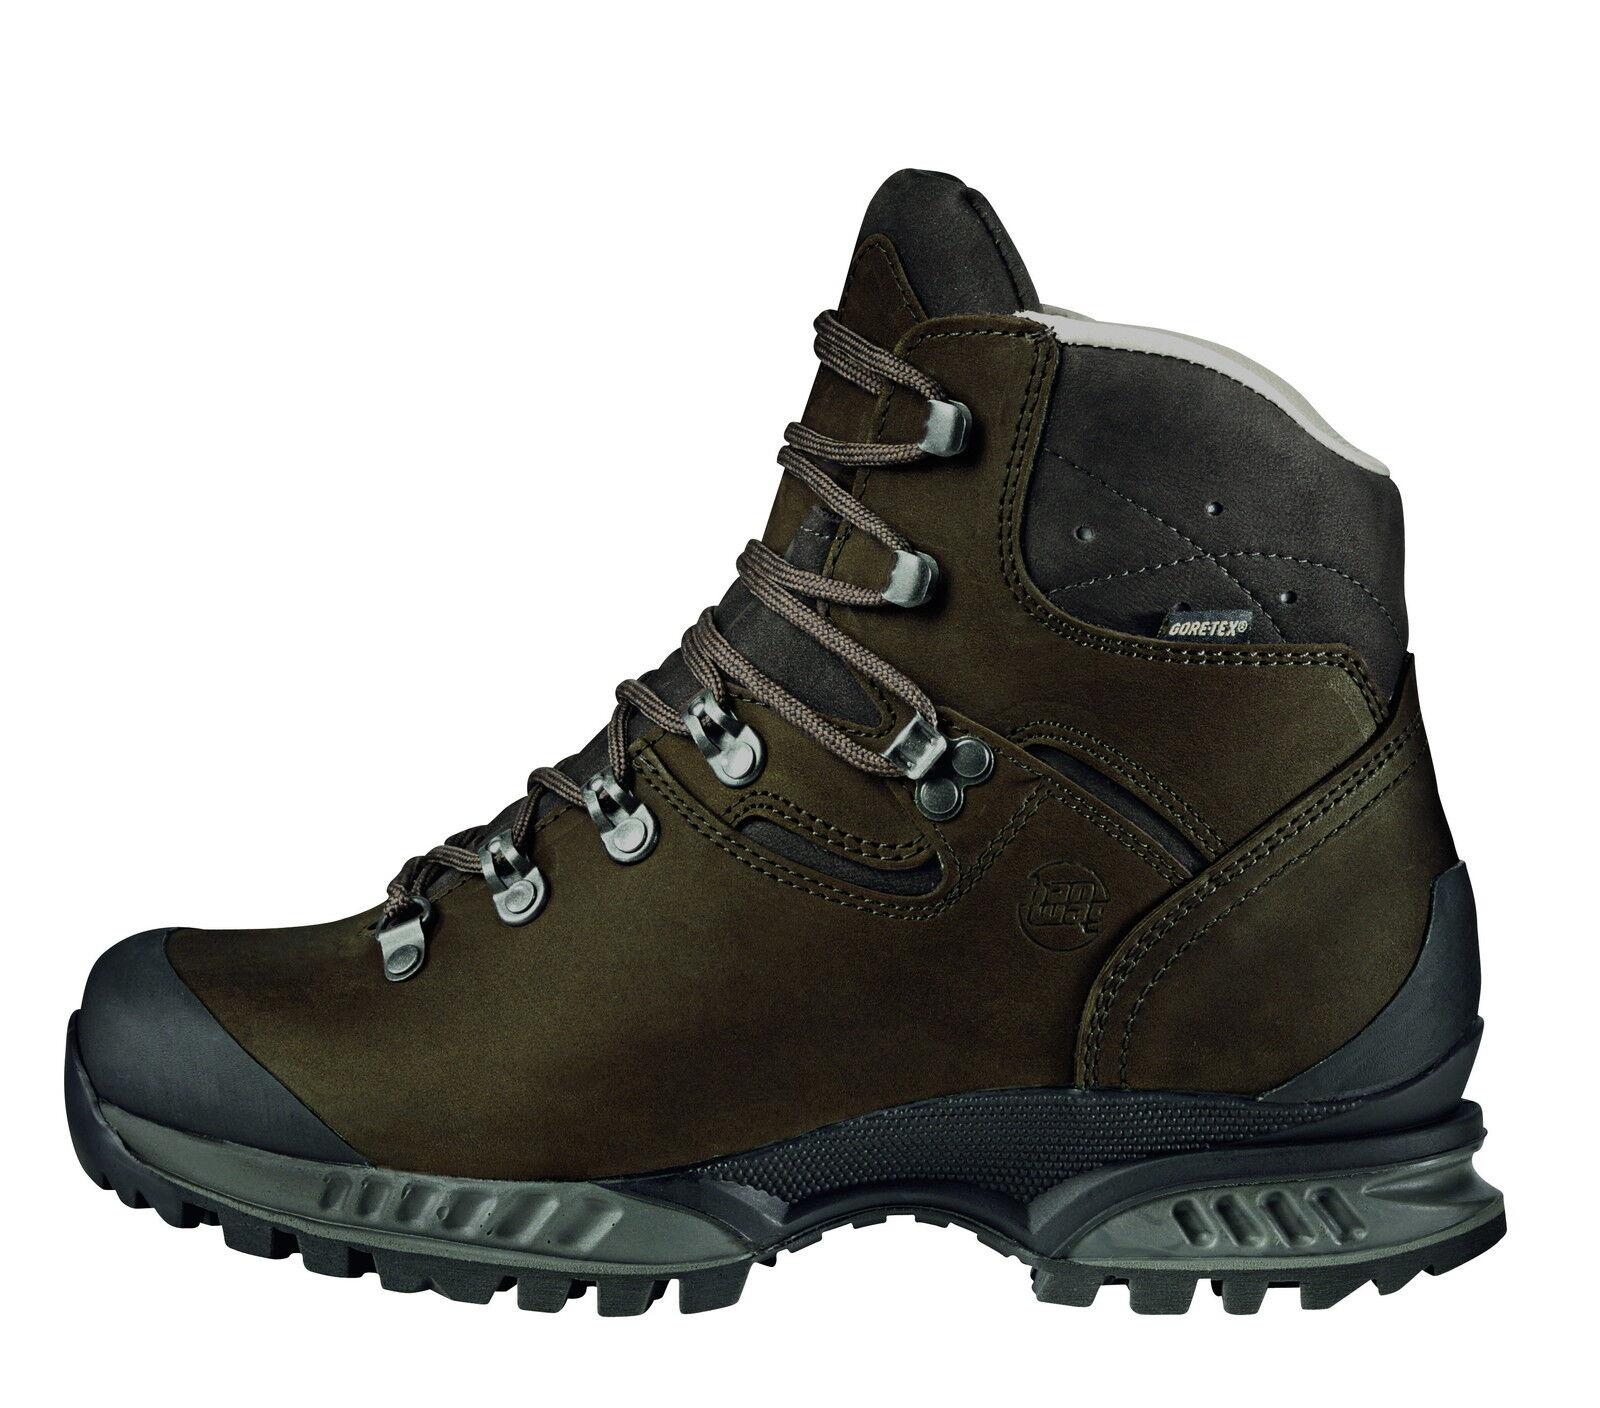 Hanwag Mountain  shoes  Tatra Lady GTX Gore-Tex Size 6 - 40  hot sales